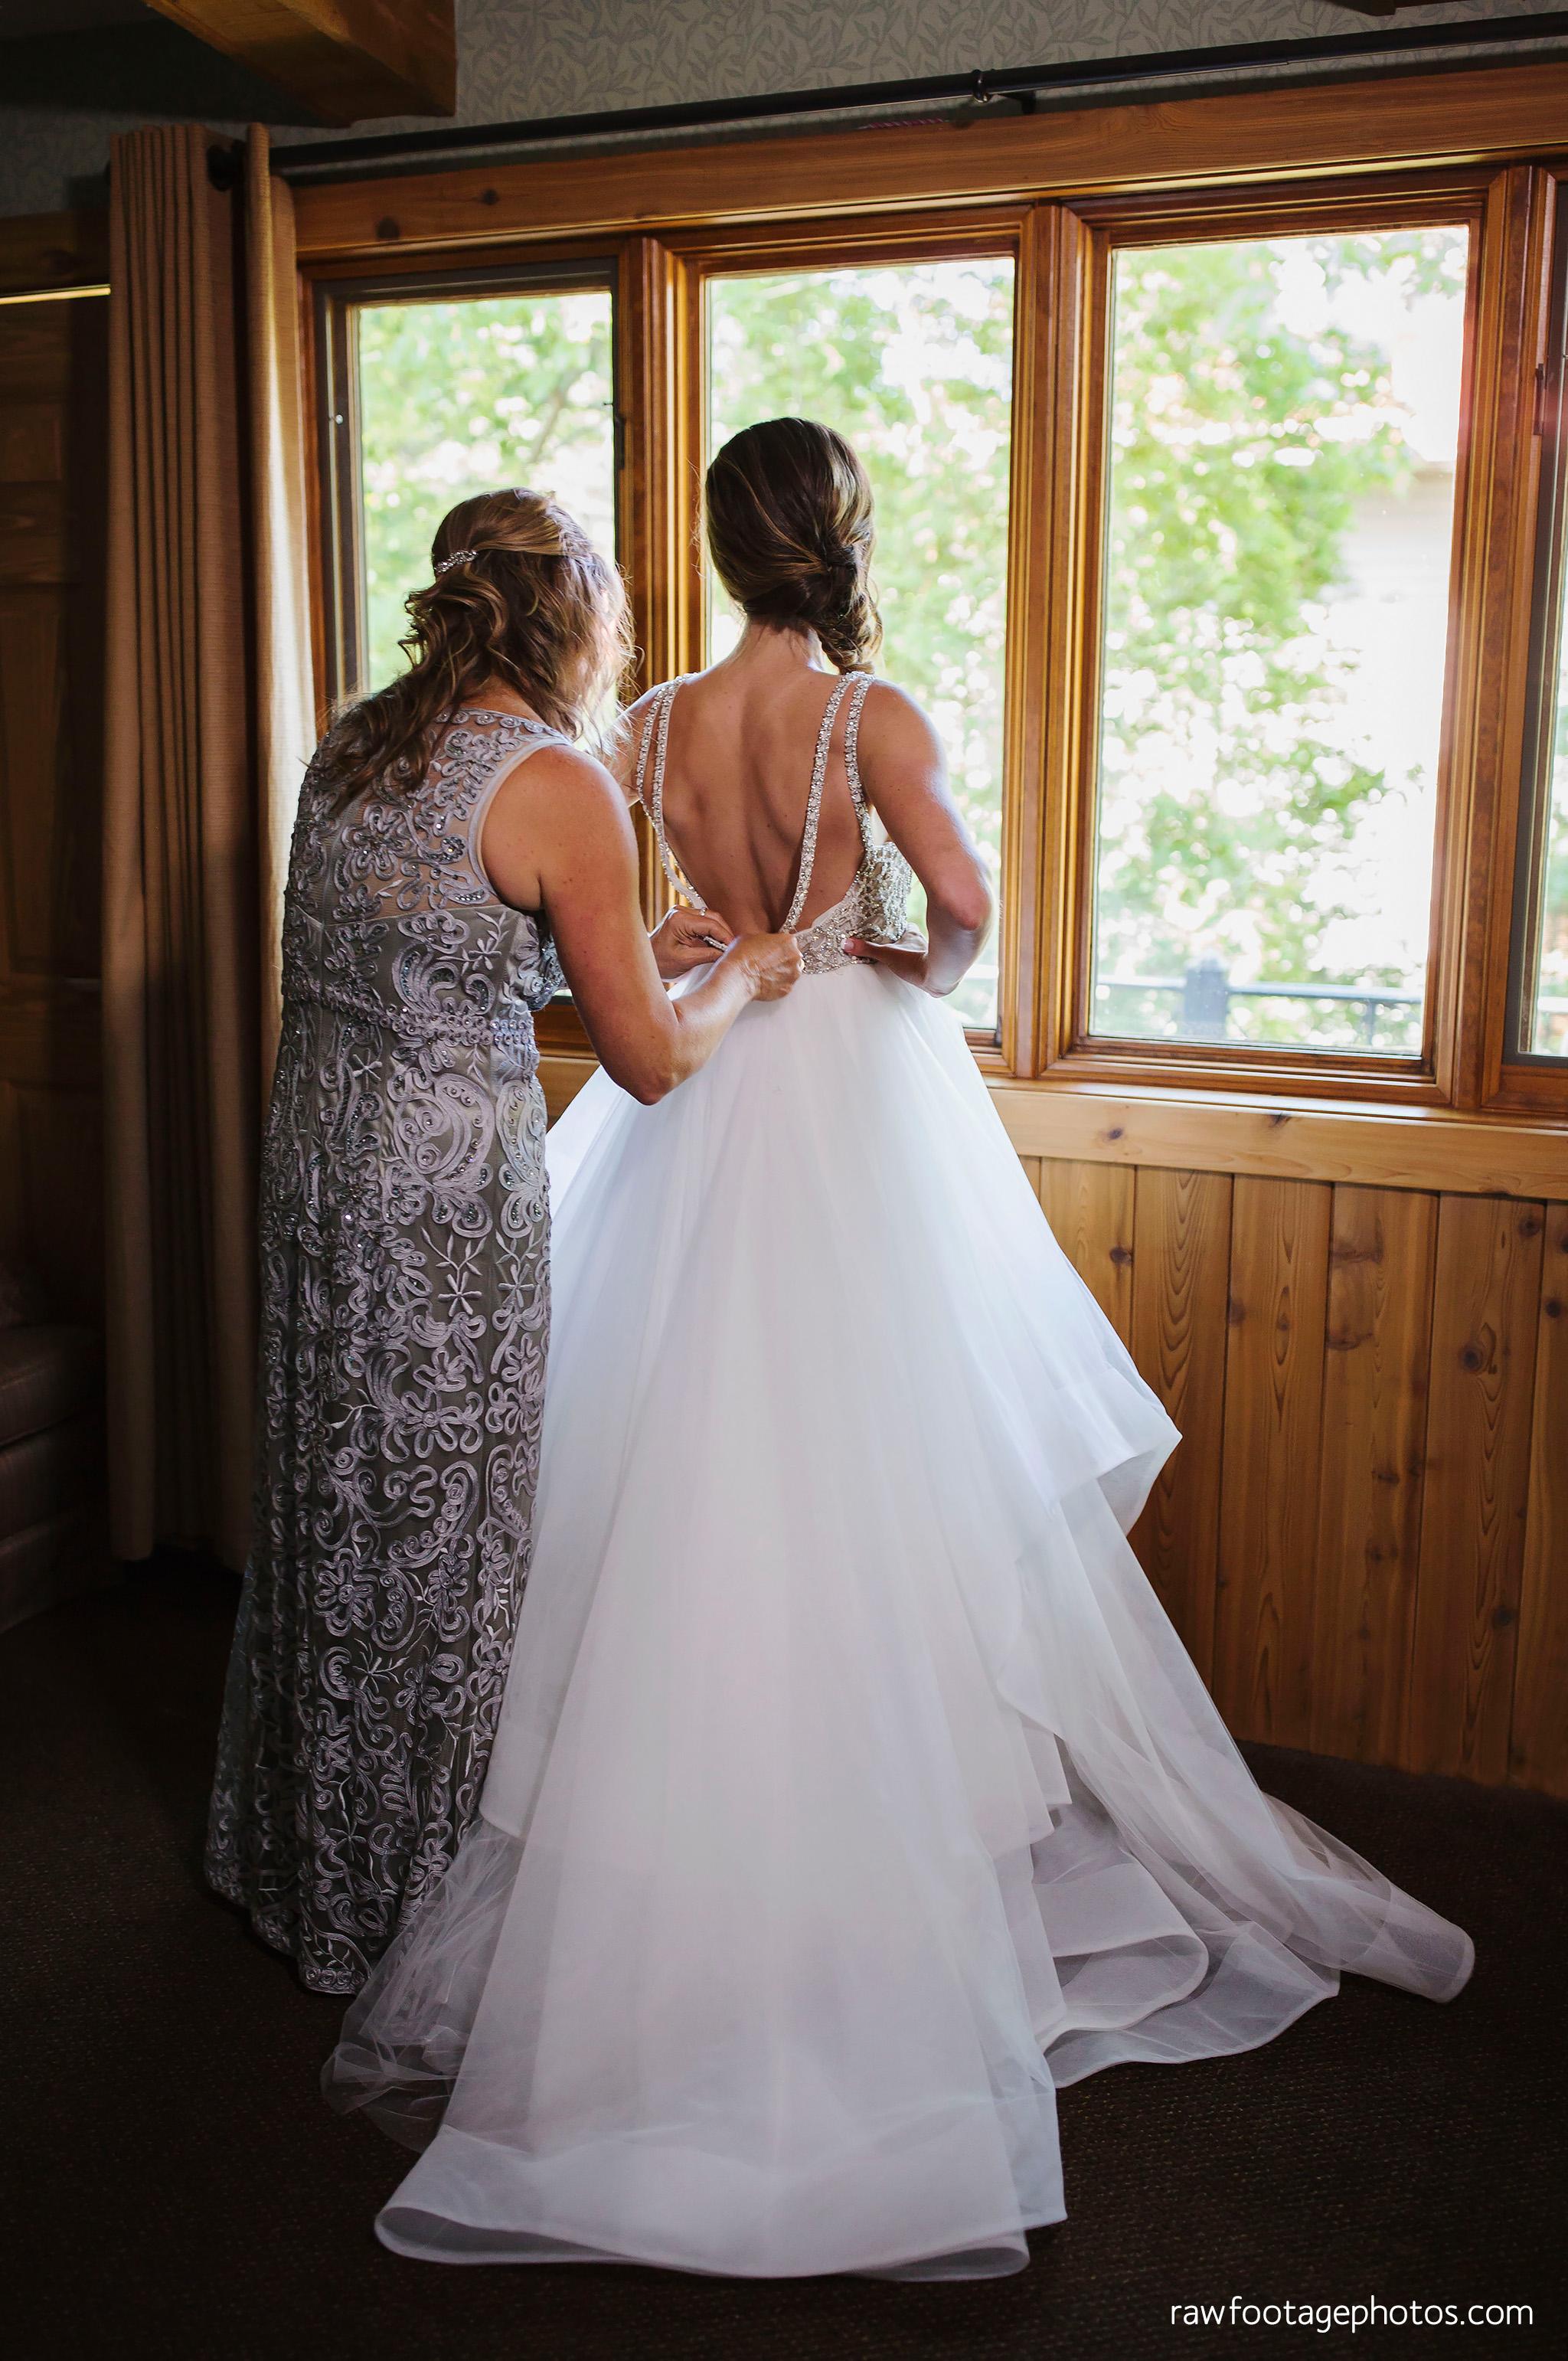 london_ontario_wedding_photographer-grand_bend_wedding_photographer-oakwood_resort_wedding-beach_wedding-sunset_wedding-raw_footage_photography018.jpg